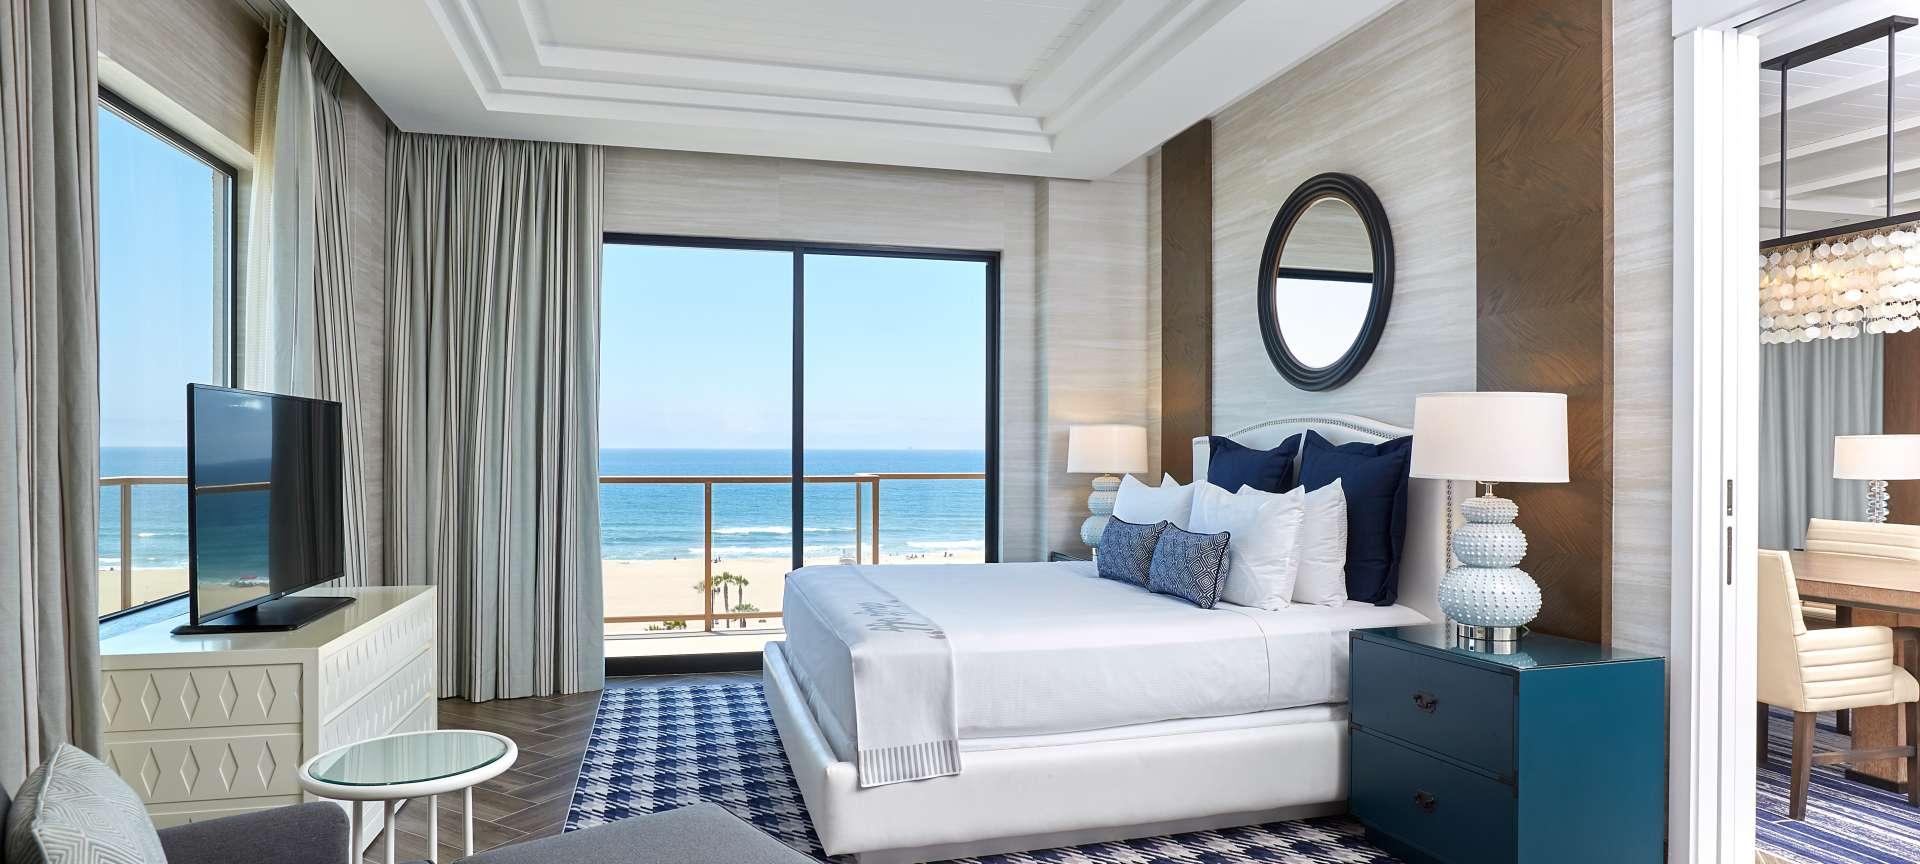 Huntington Beach Resorts Luxury